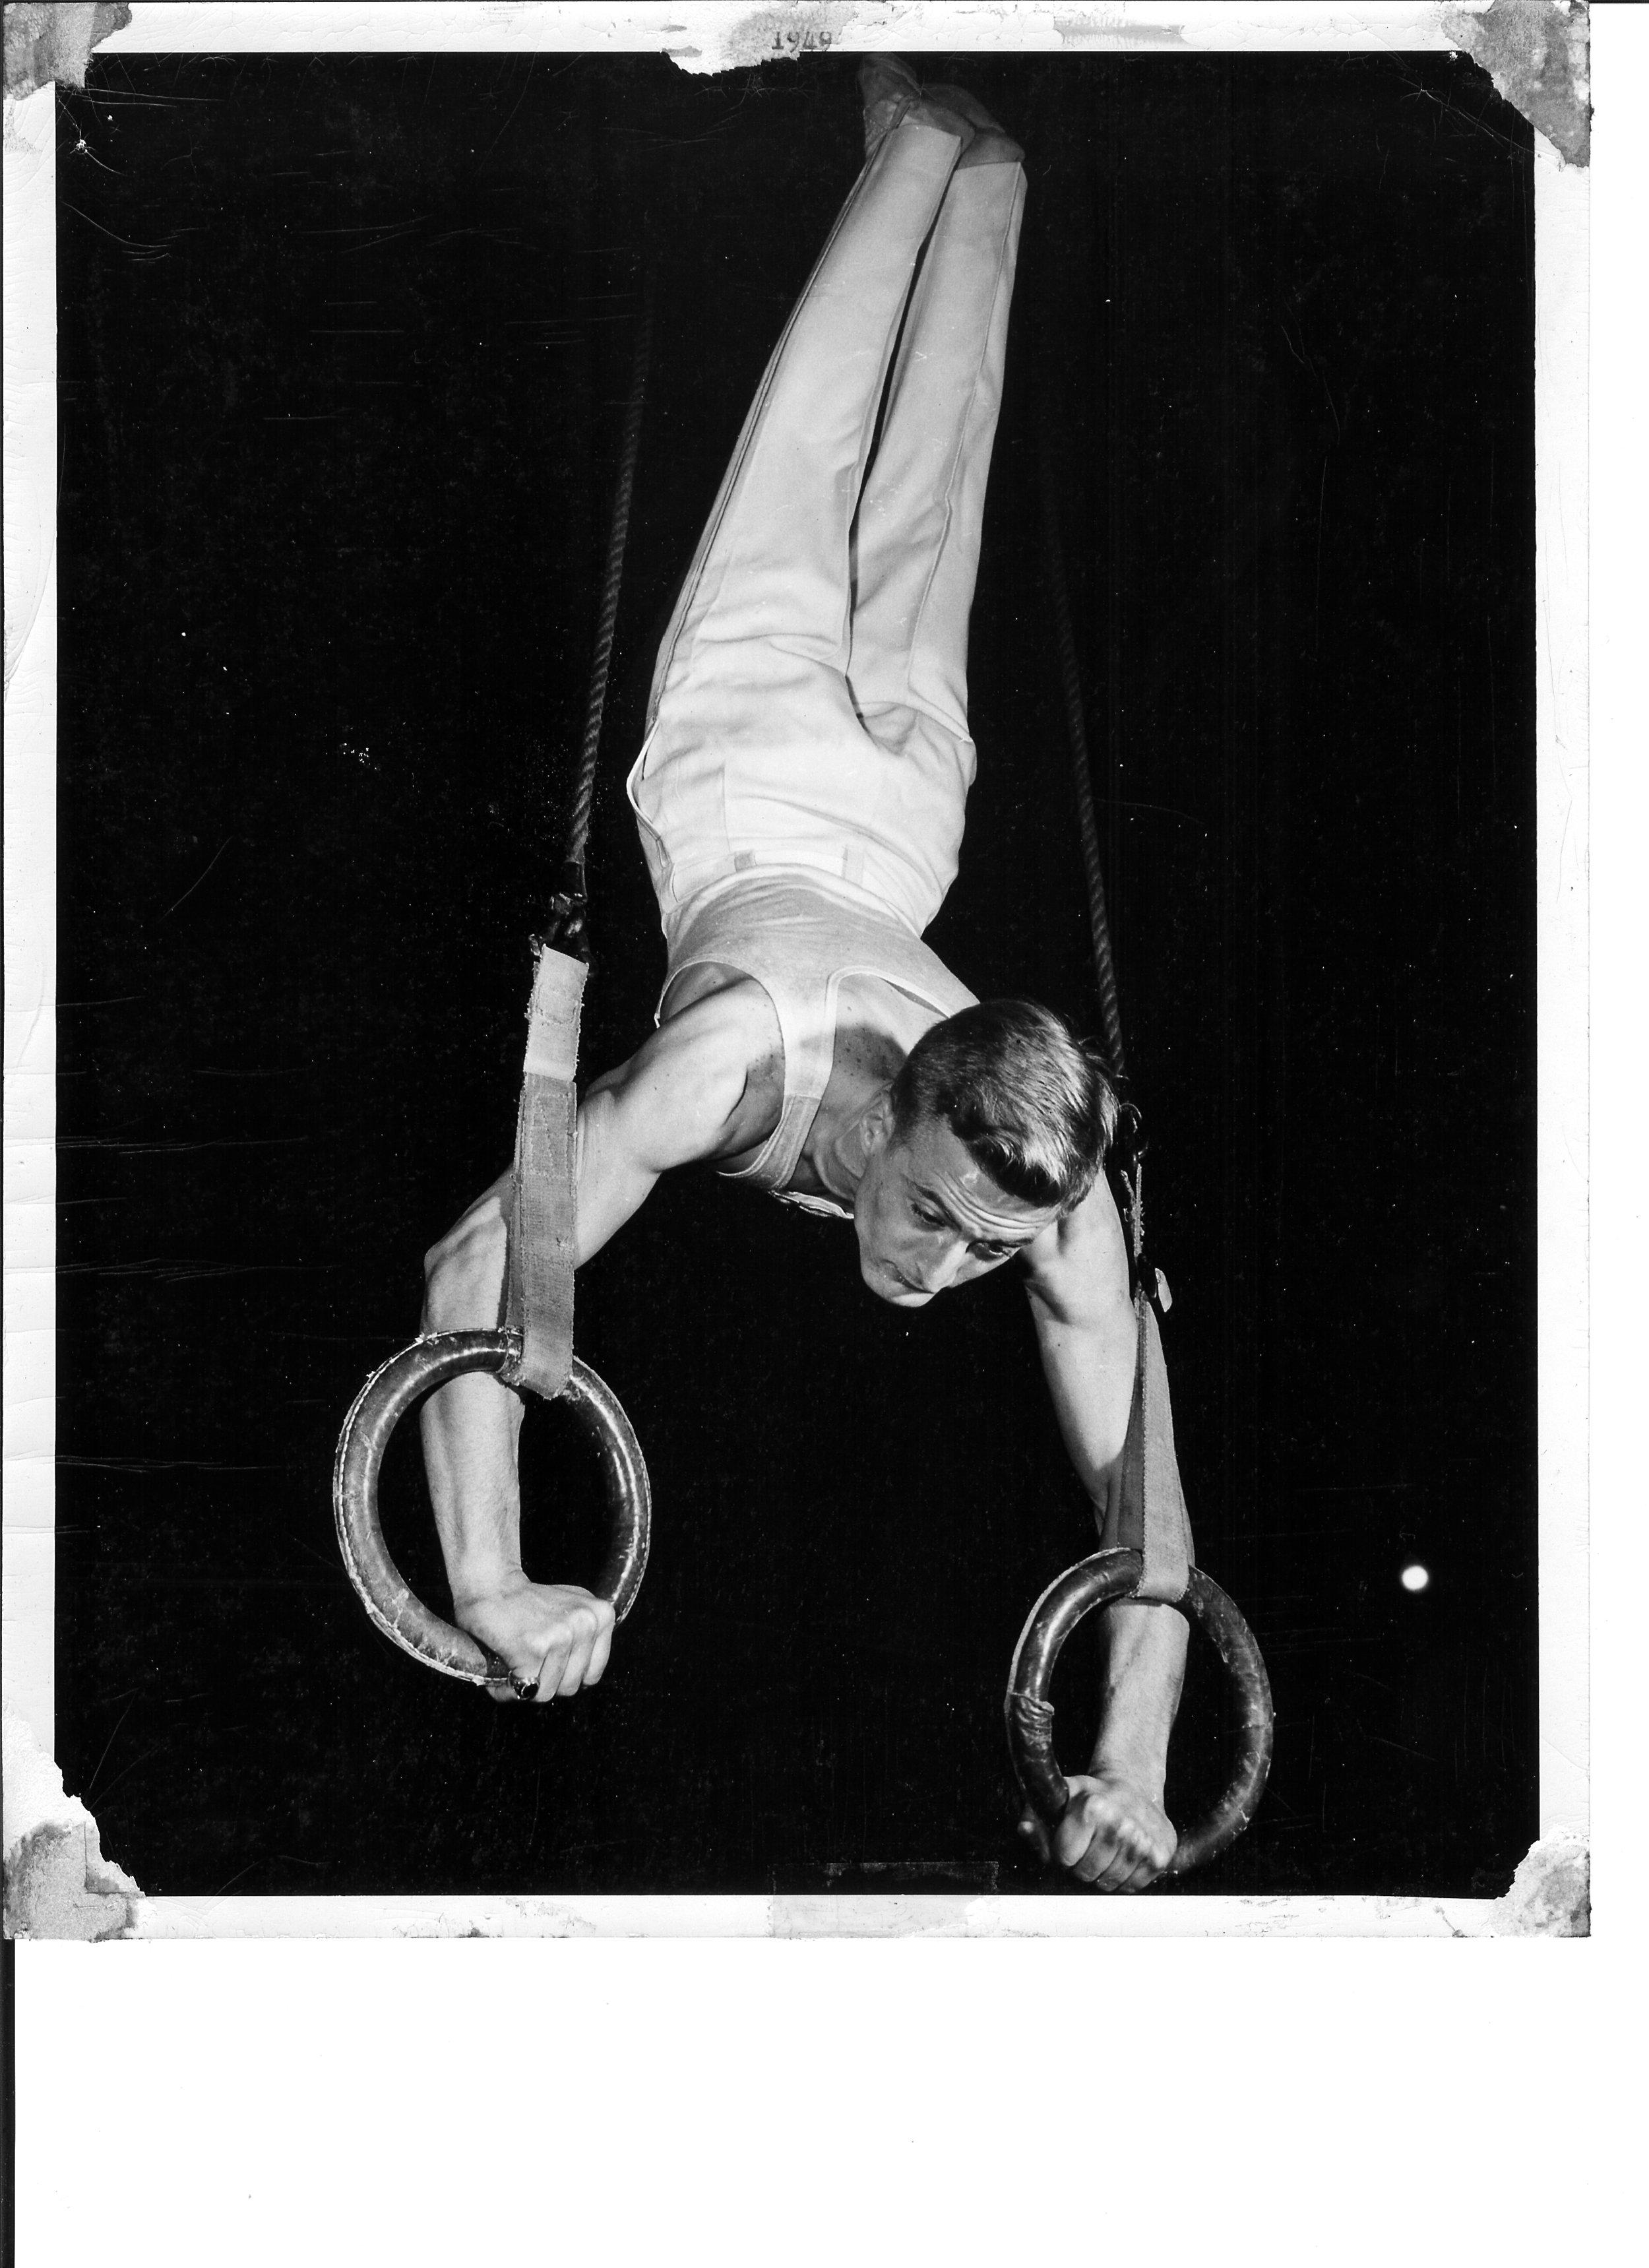 1949 Al Kuckhoff at DCAAU Gymnastics Championships on Flying Rings.jpg